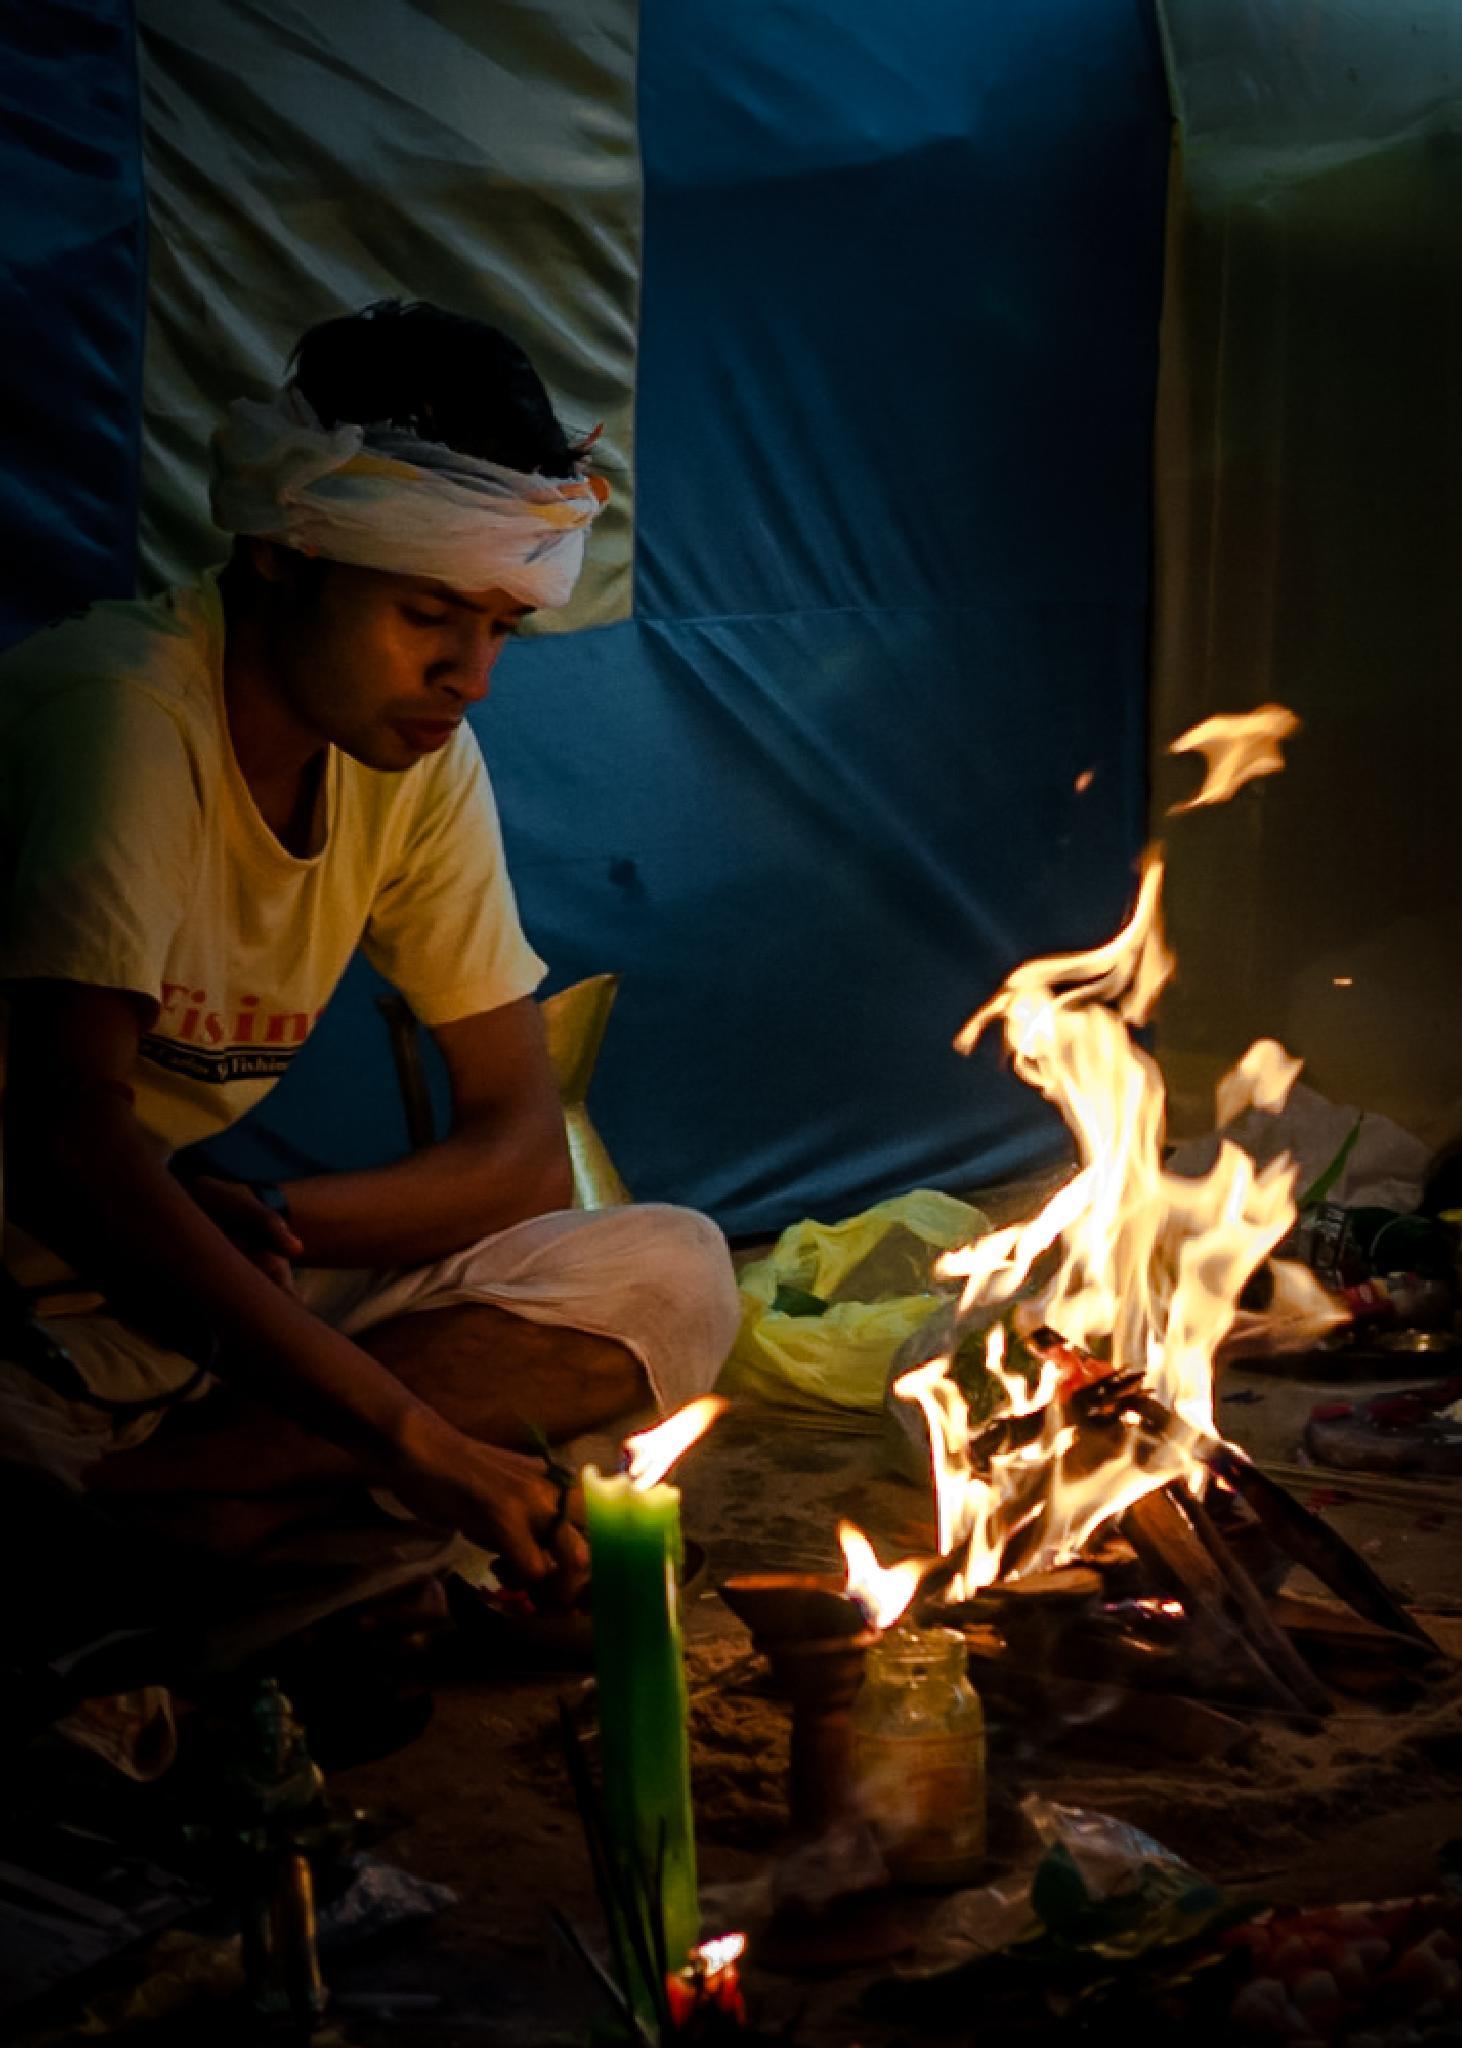 The Holy Fire by Santanu Chandra